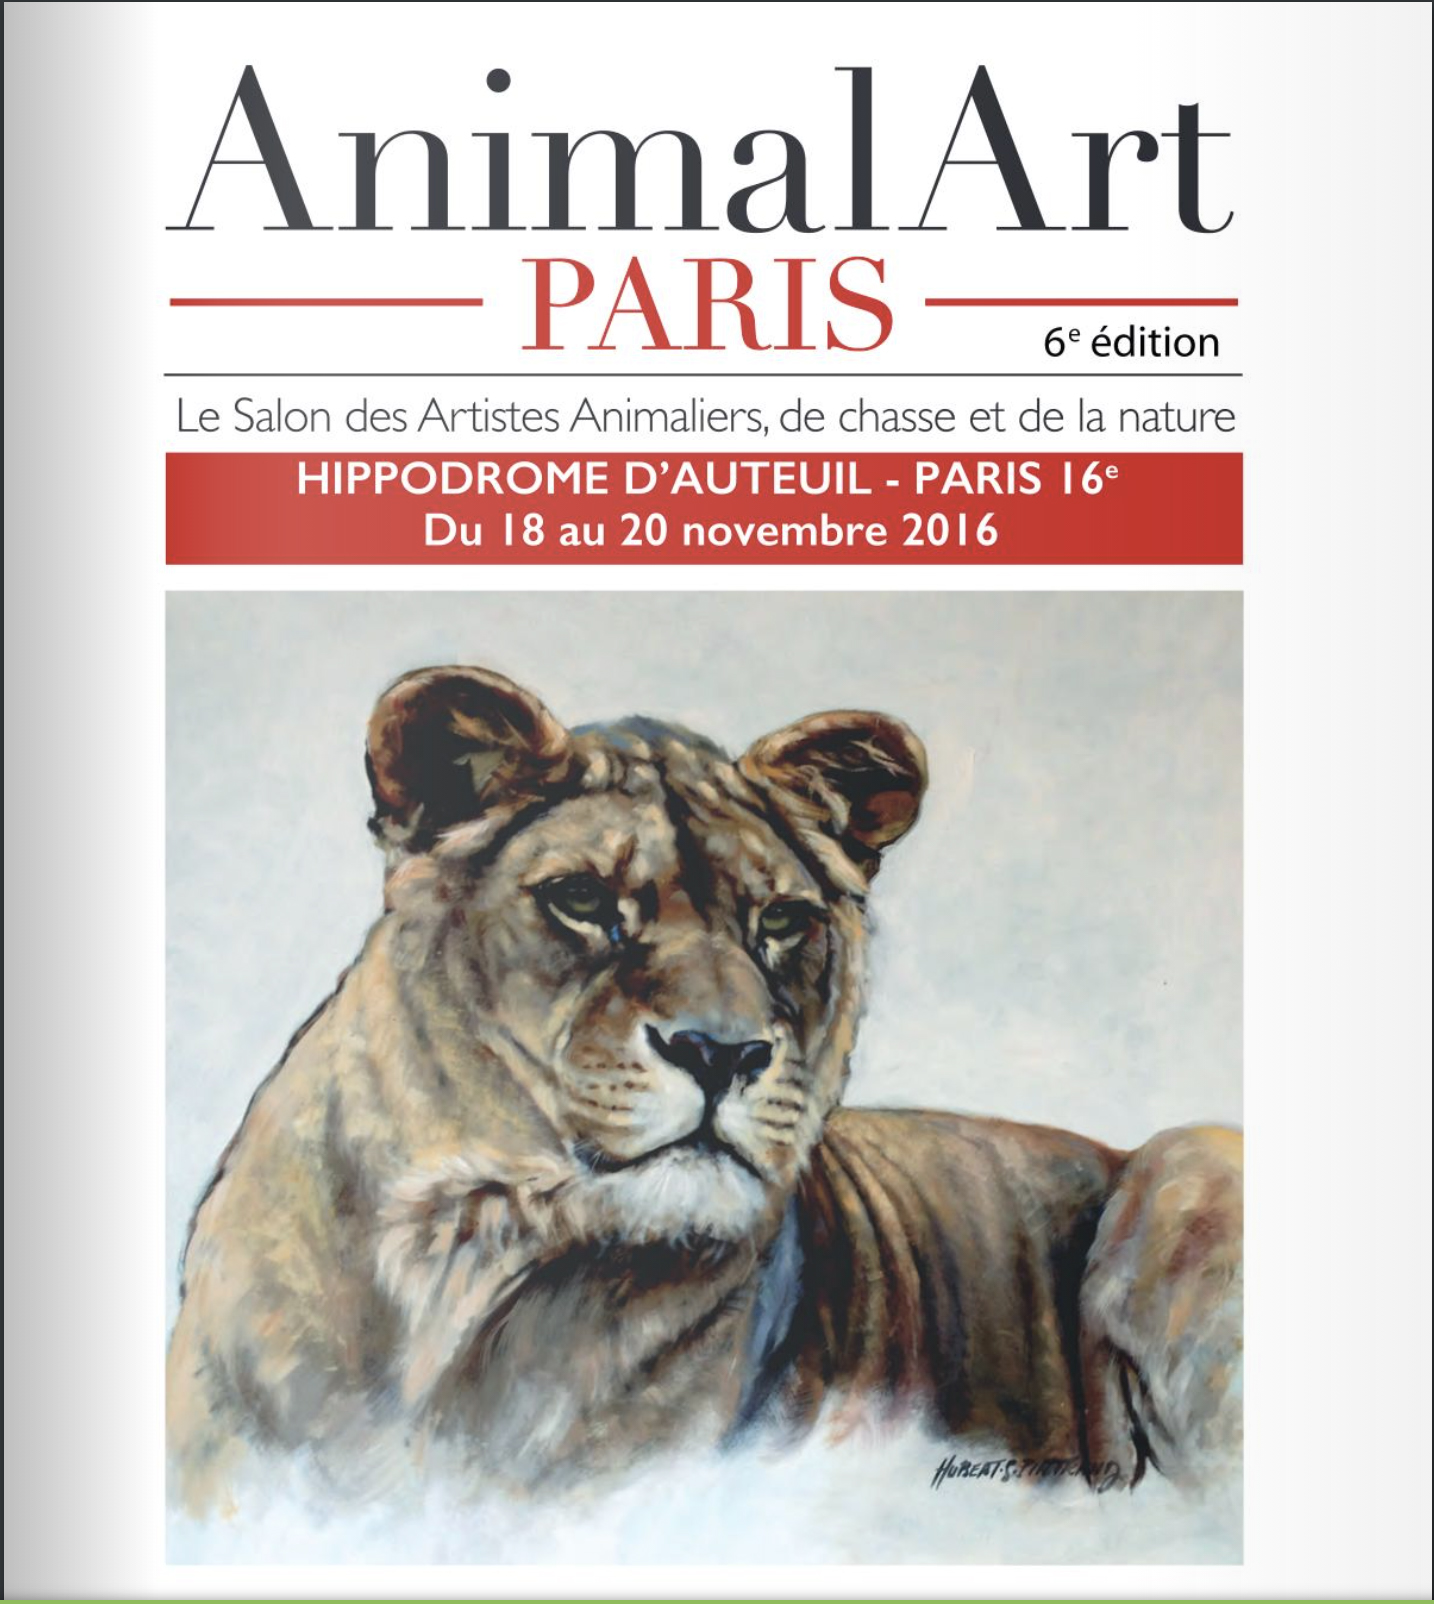 6e salon Animal art - Paris 2016